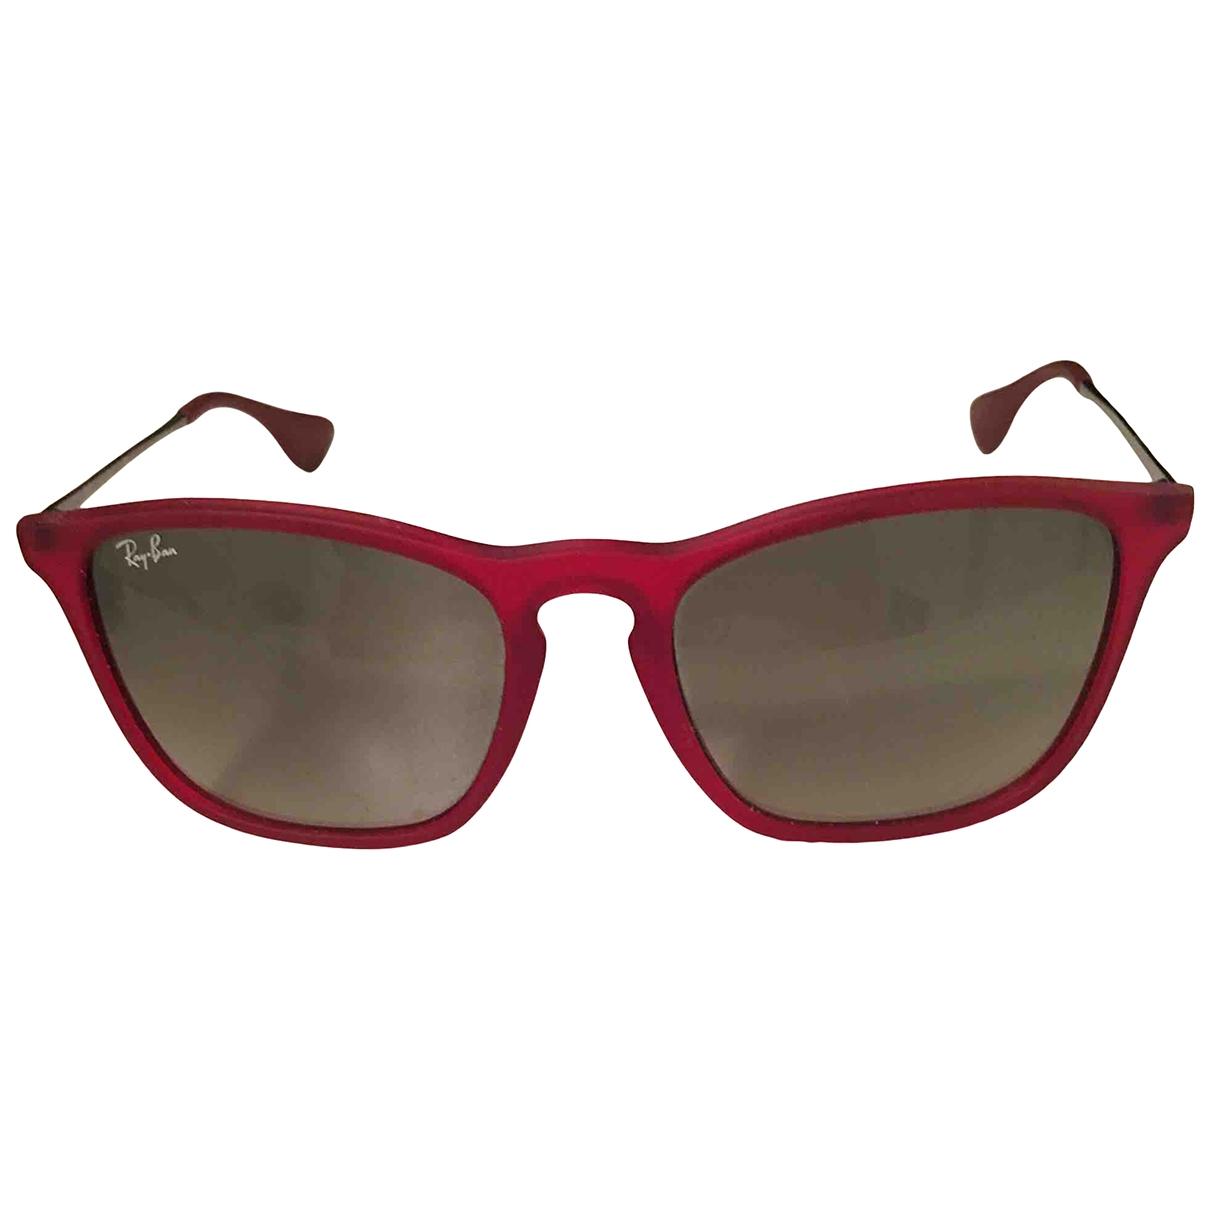 Ray-ban - Lunettes   pour femme - rouge